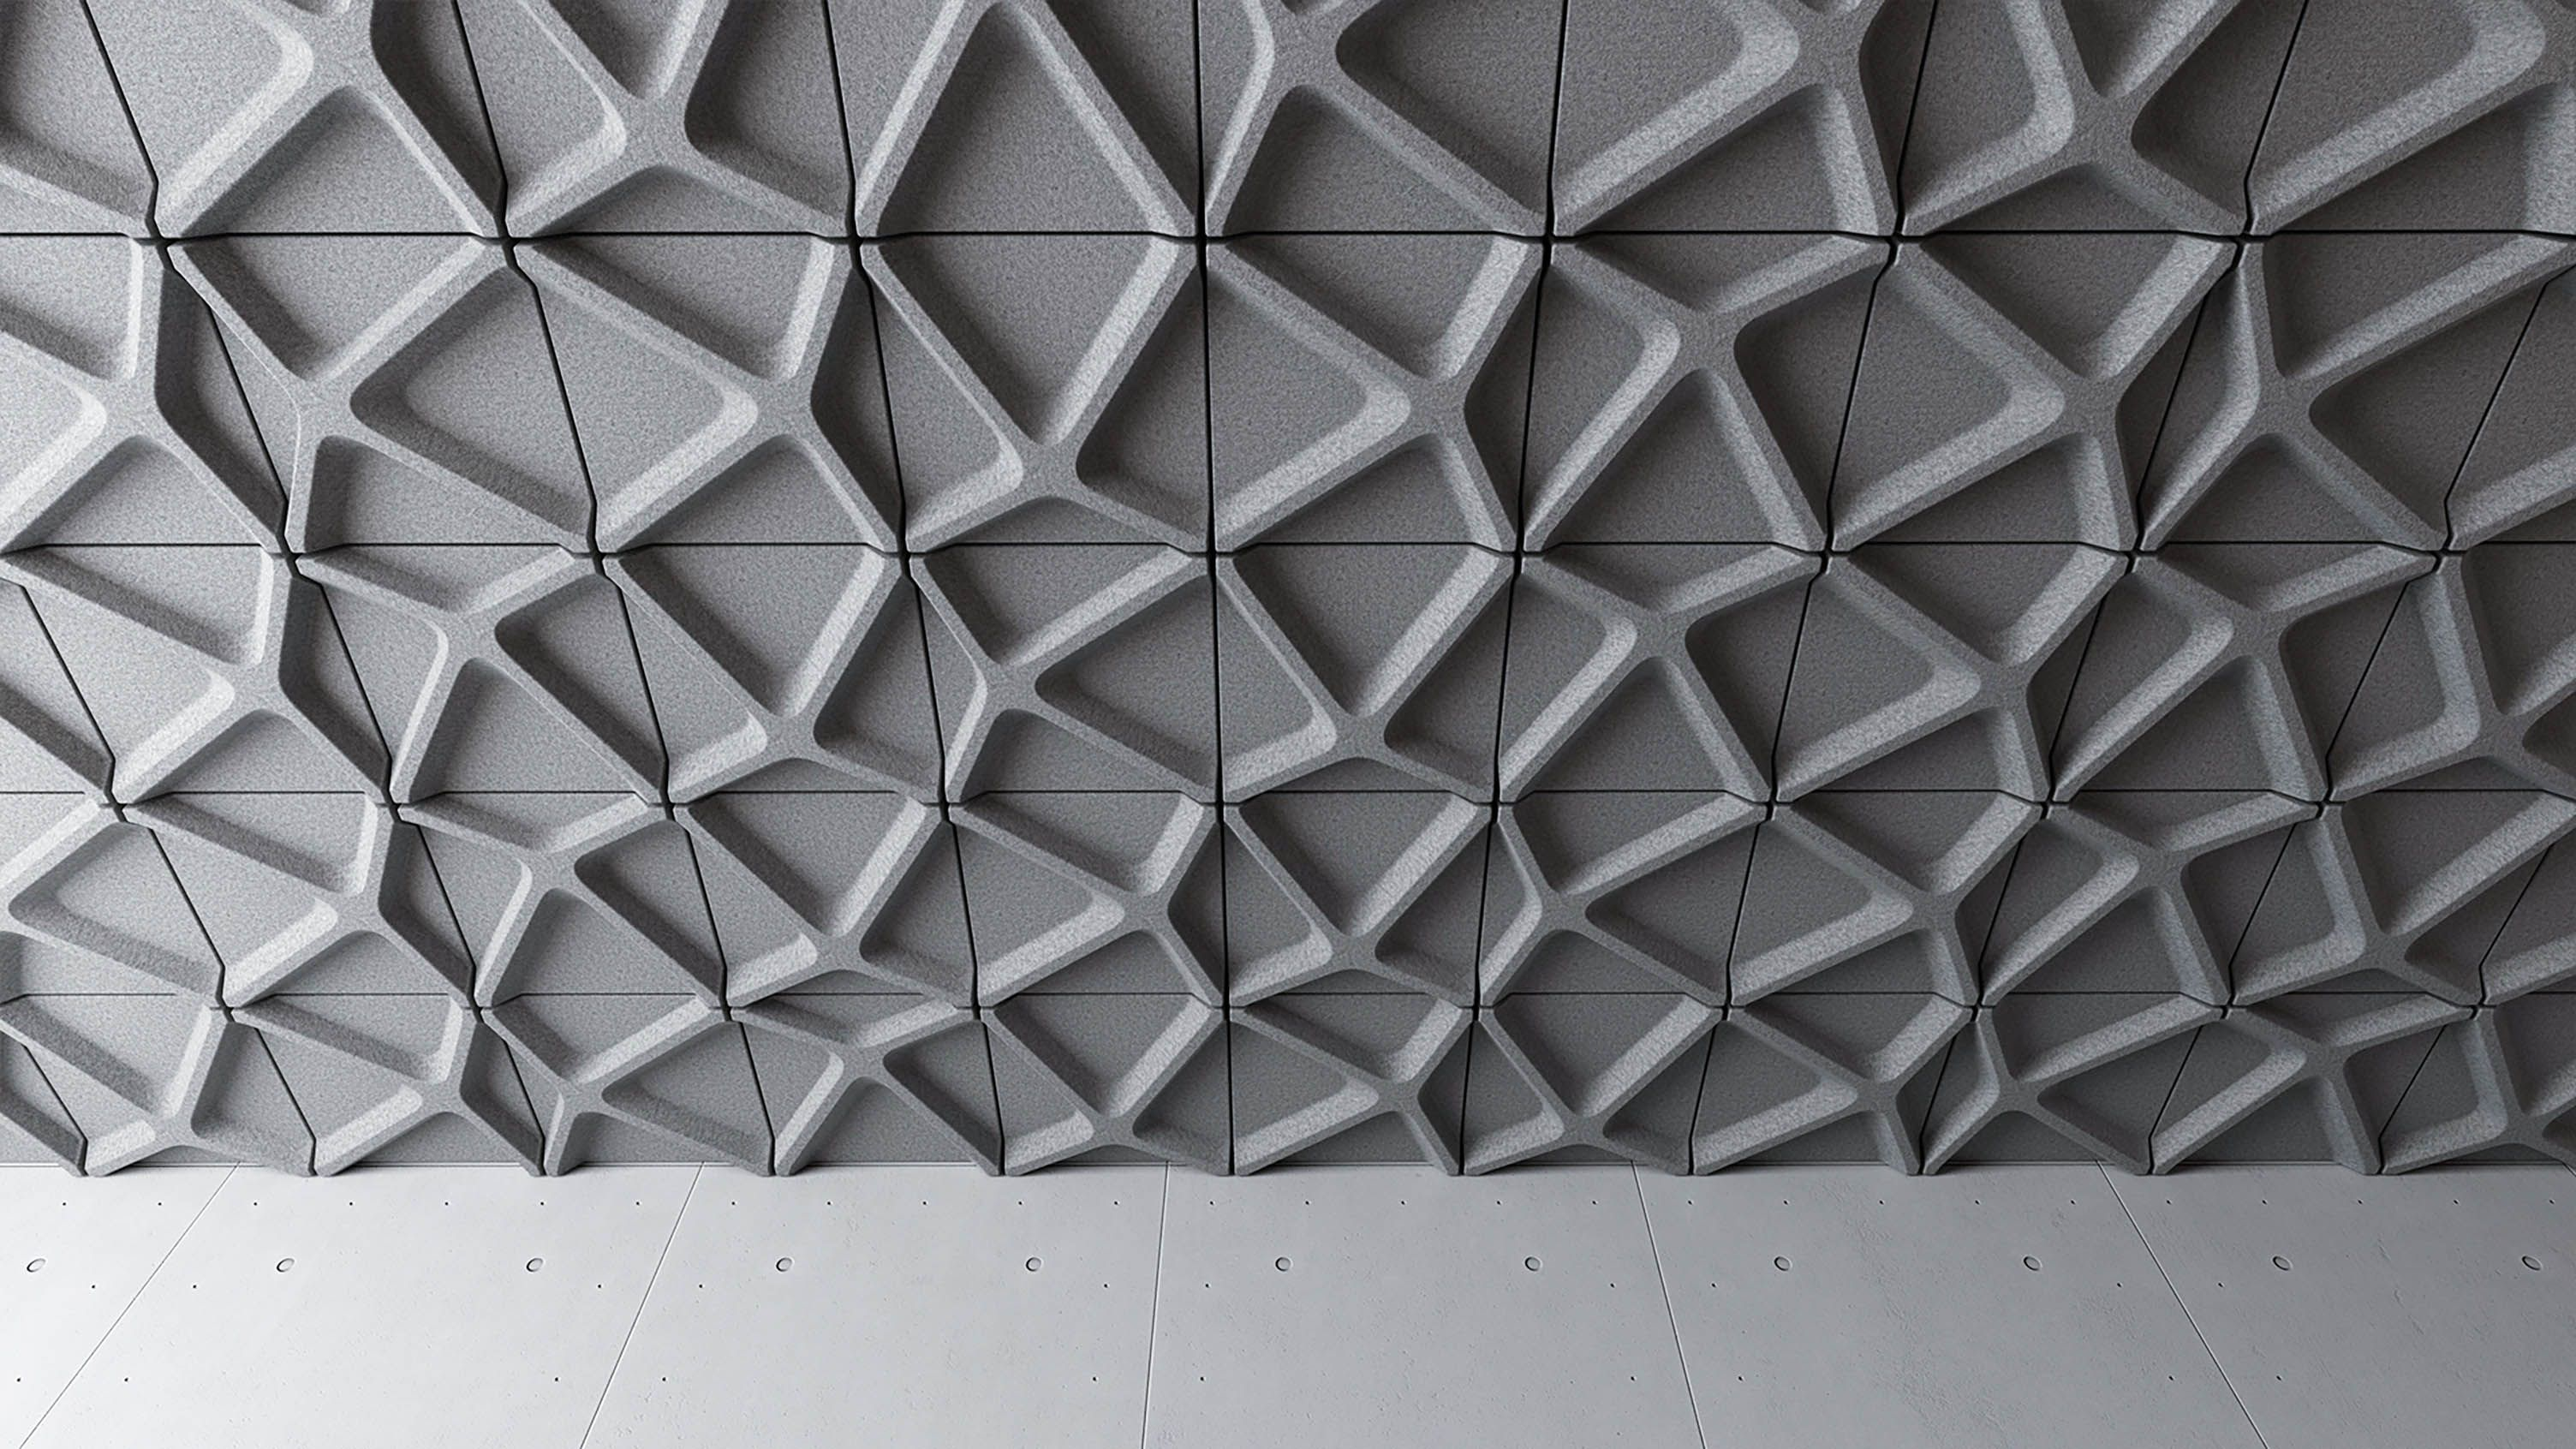 Voronoi Ceiling Tile Turf Materials Finishes Pinterest